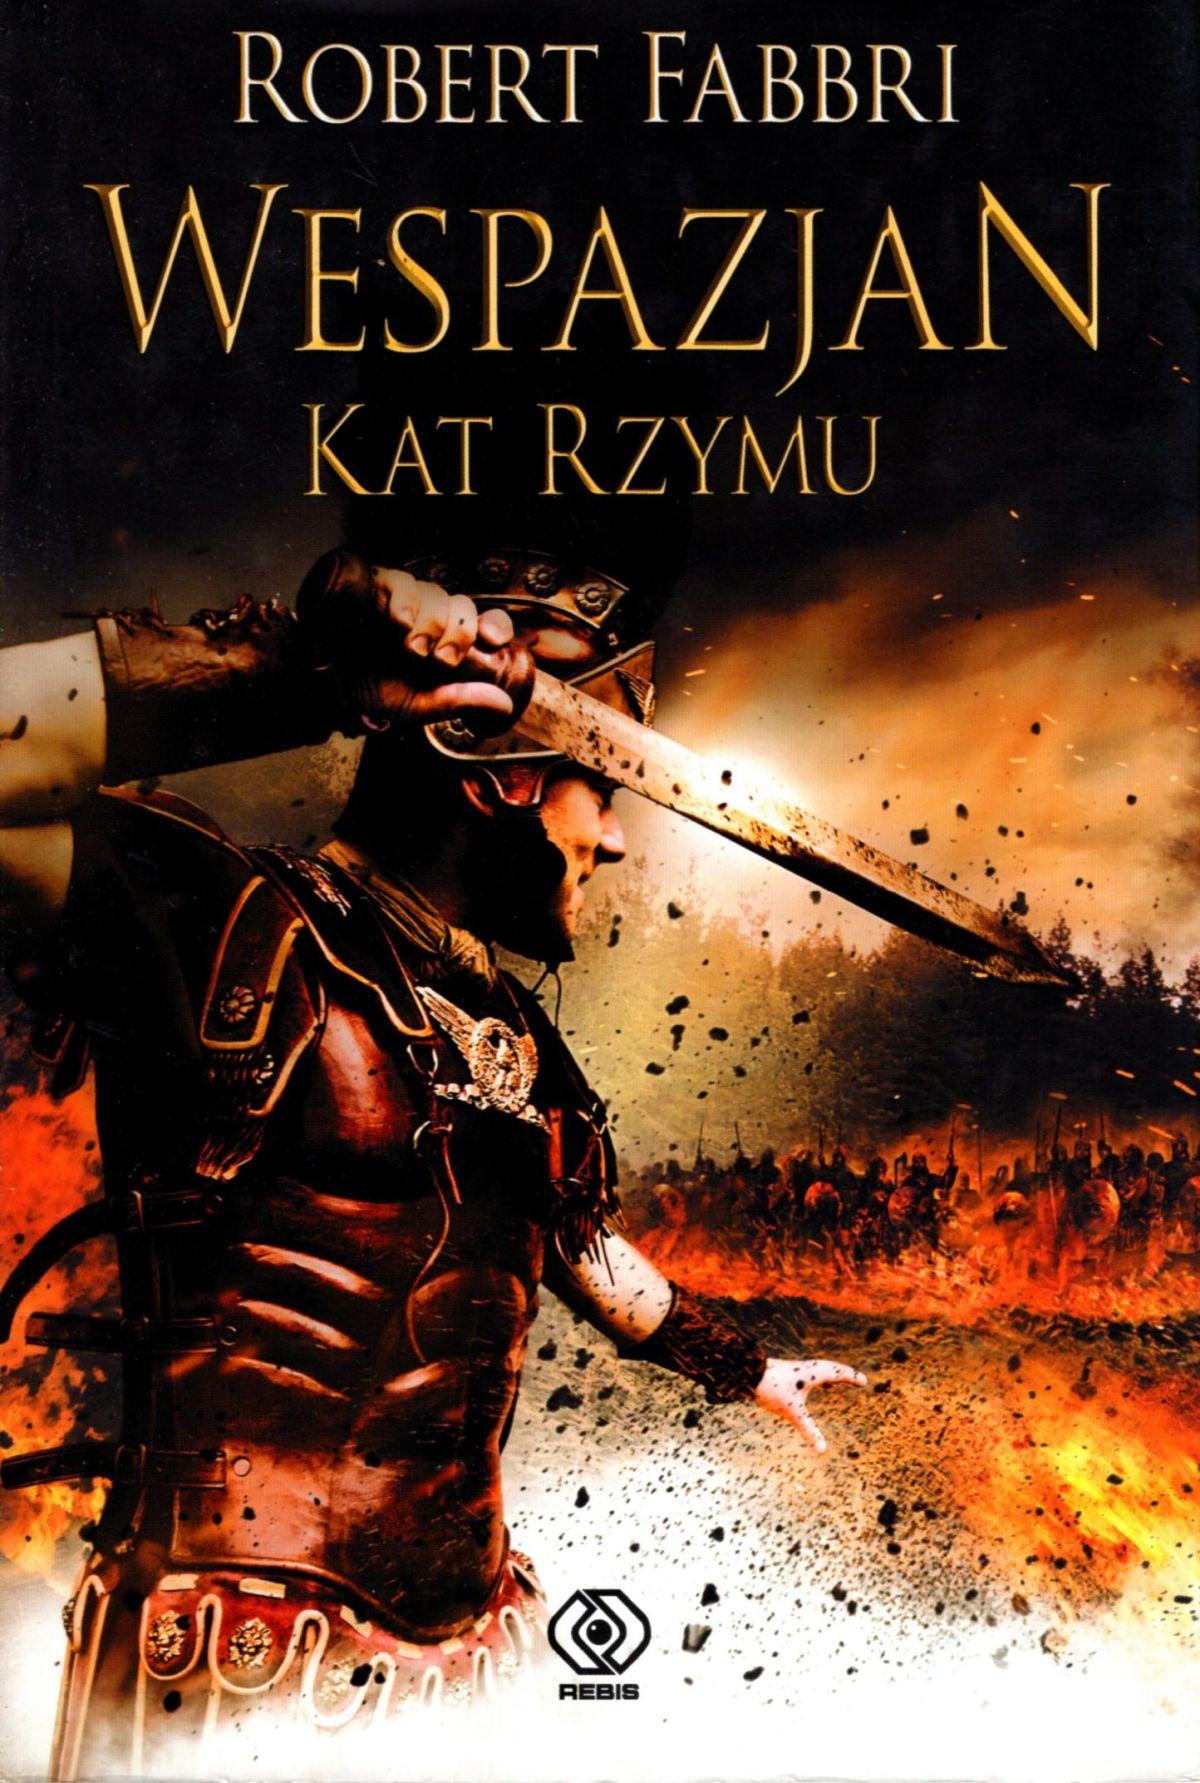 Robert Fabbri, Wespazjan. Kat Rzymu